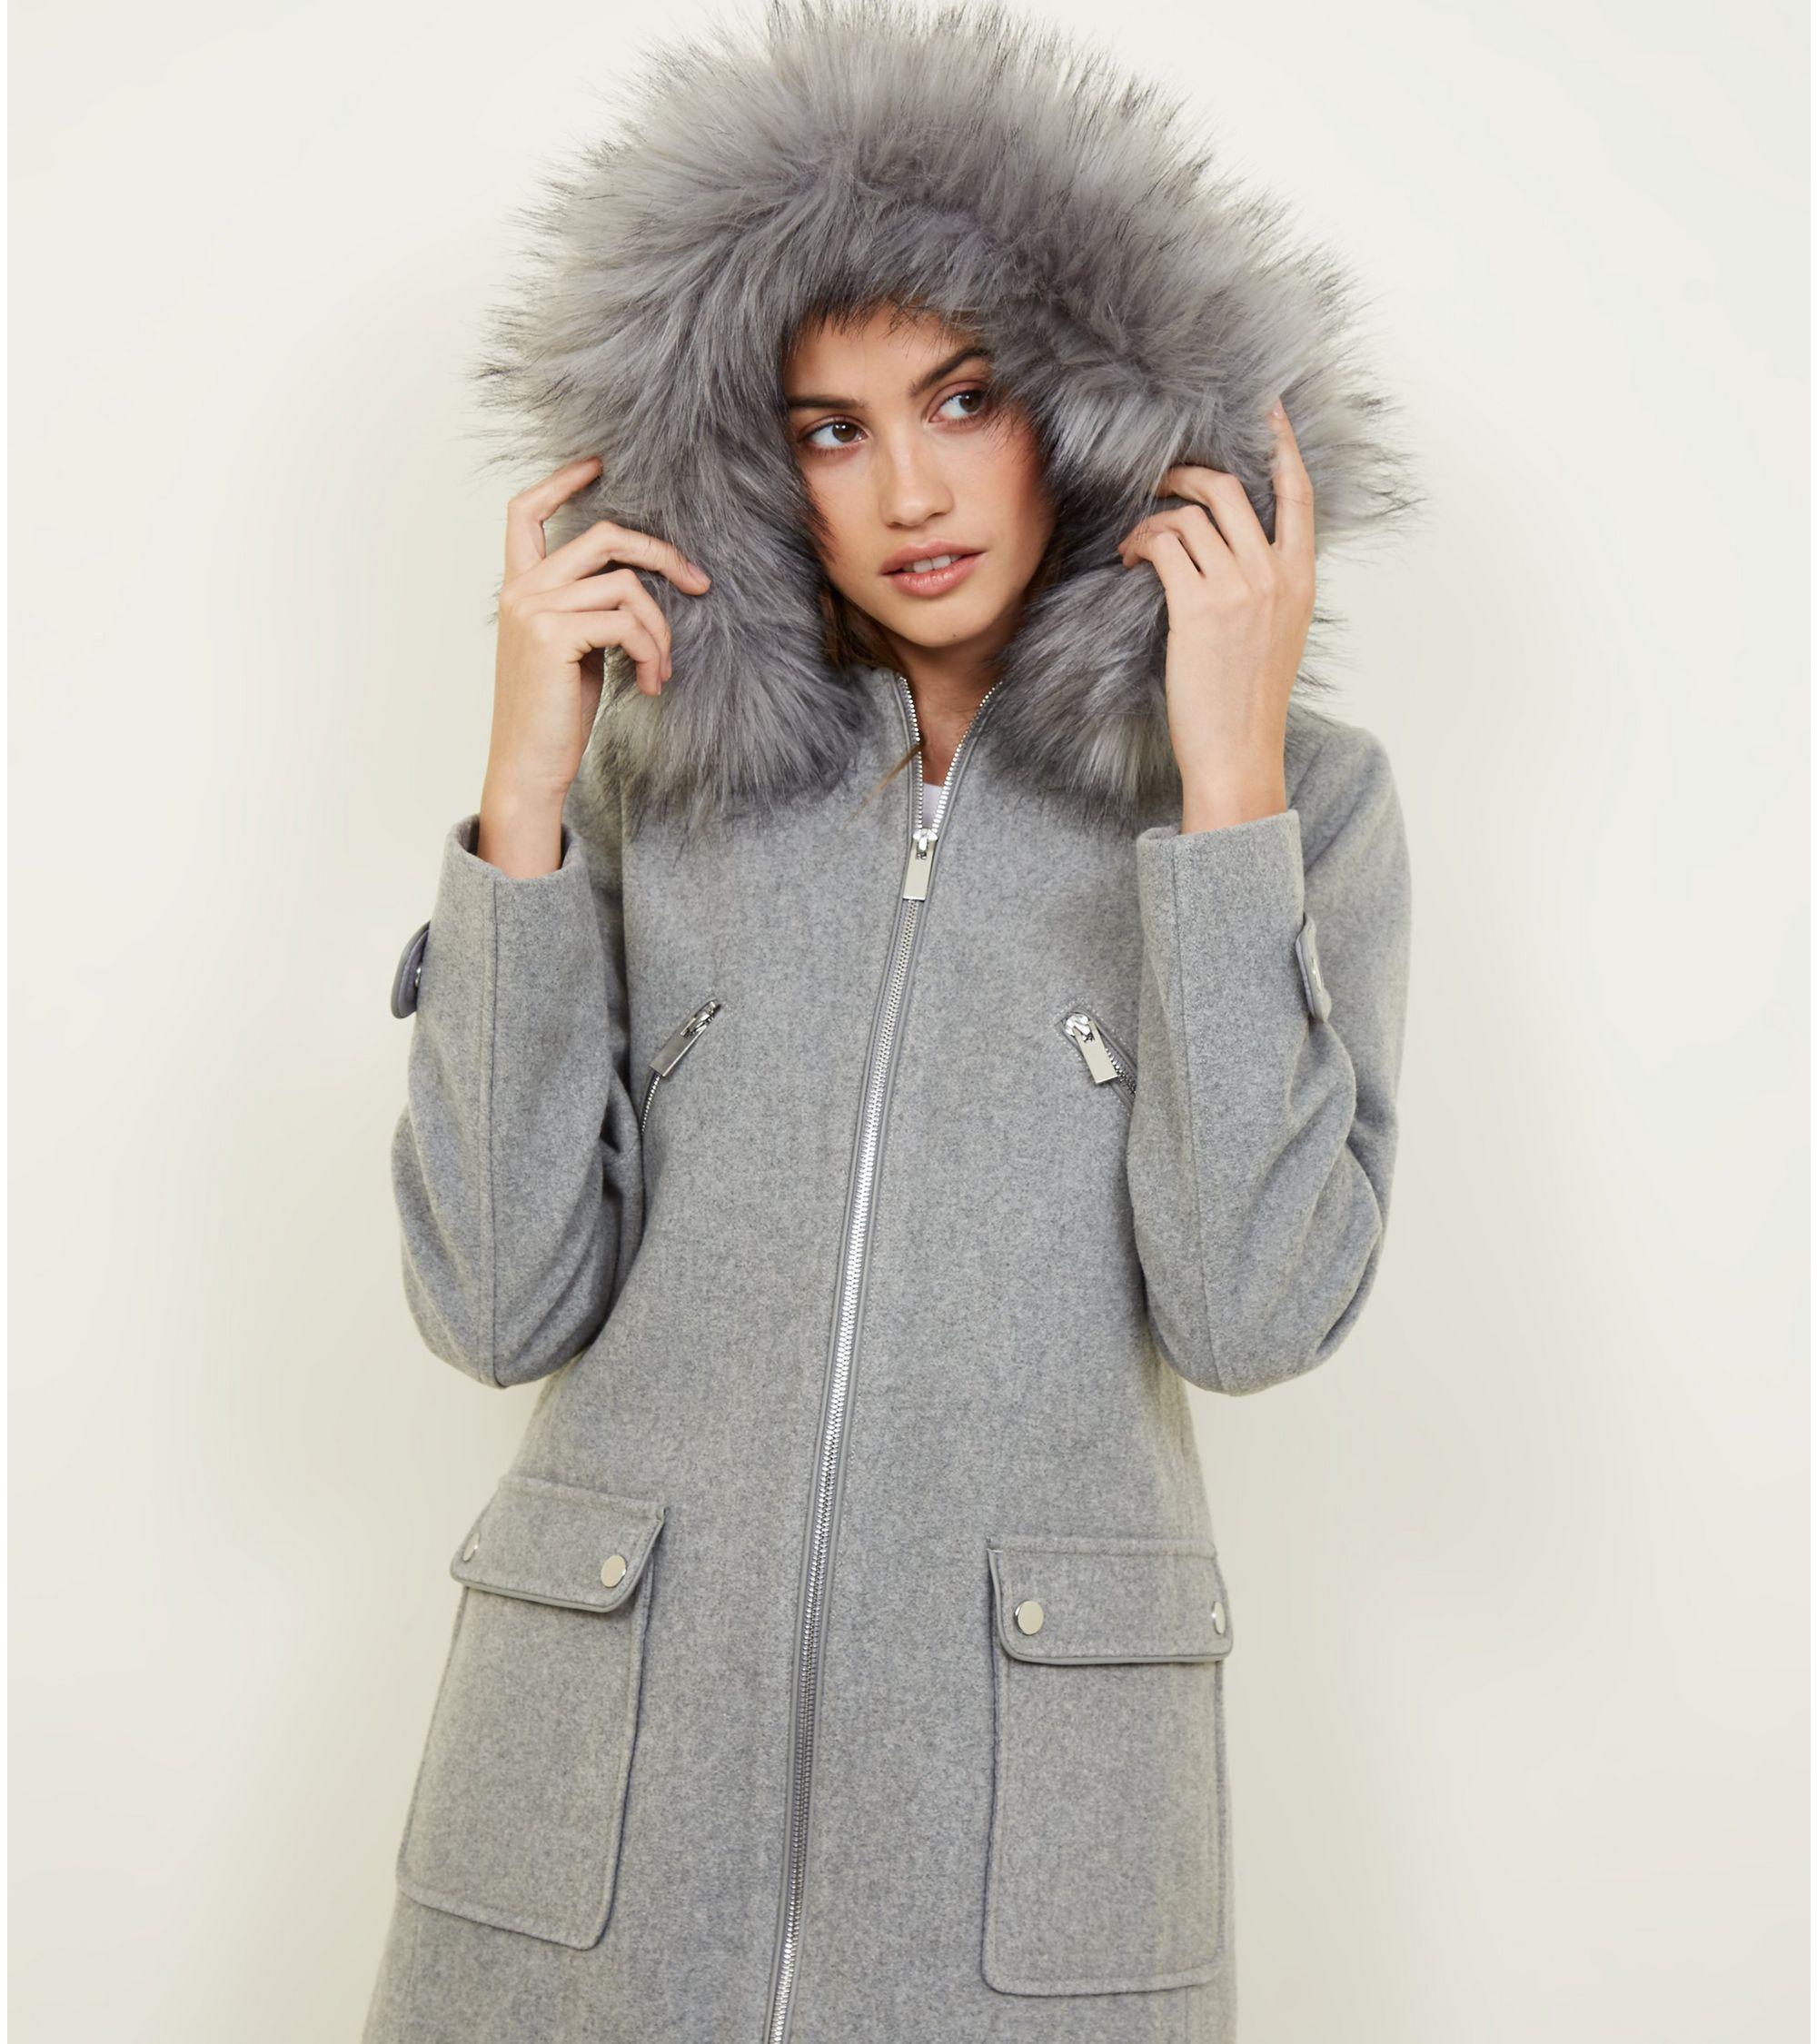 670840f1009d New Look Pale Grey Faux Fur Trim Duffle Coat at £37.49 | love the brands